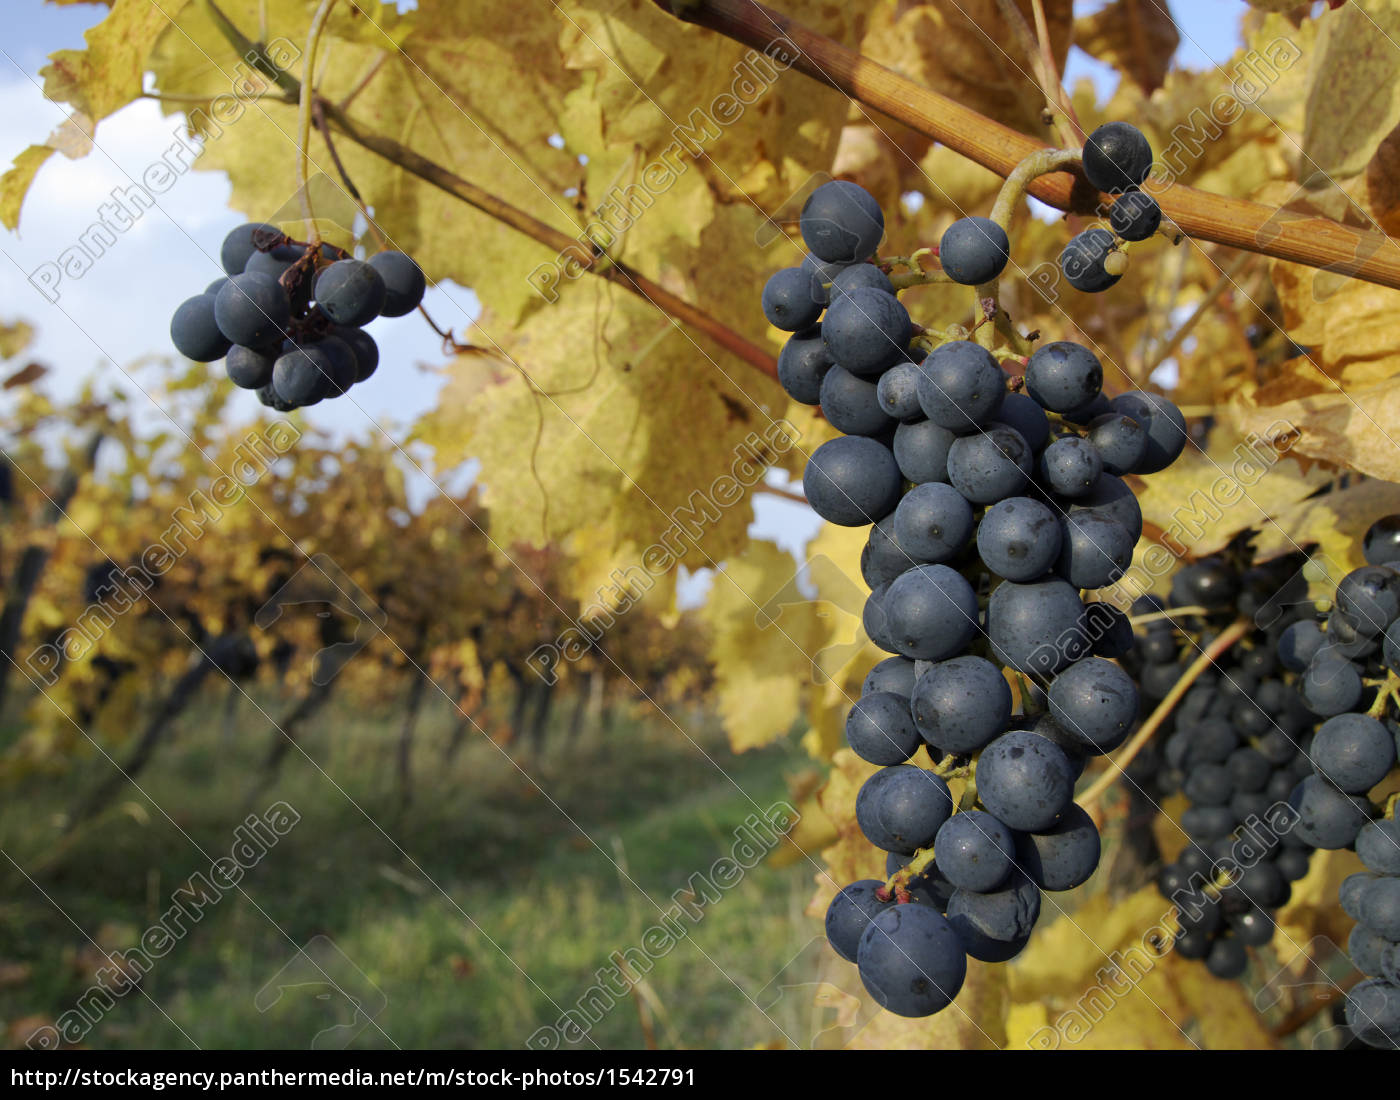 grapes - 1542791